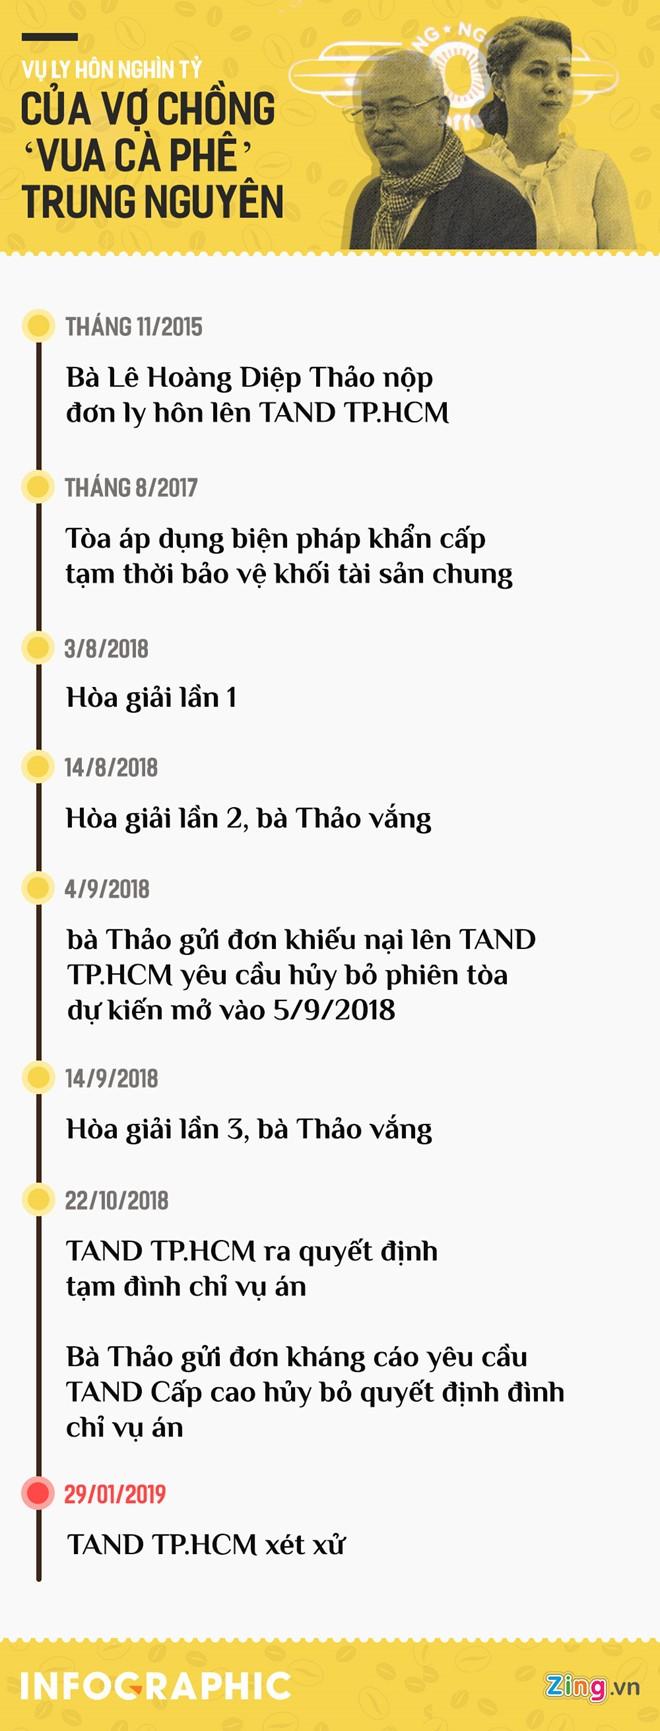 Vo chong 'vua' ca phe Trung Nguyen tiep tuc ra toa ly hon-Hinh-3